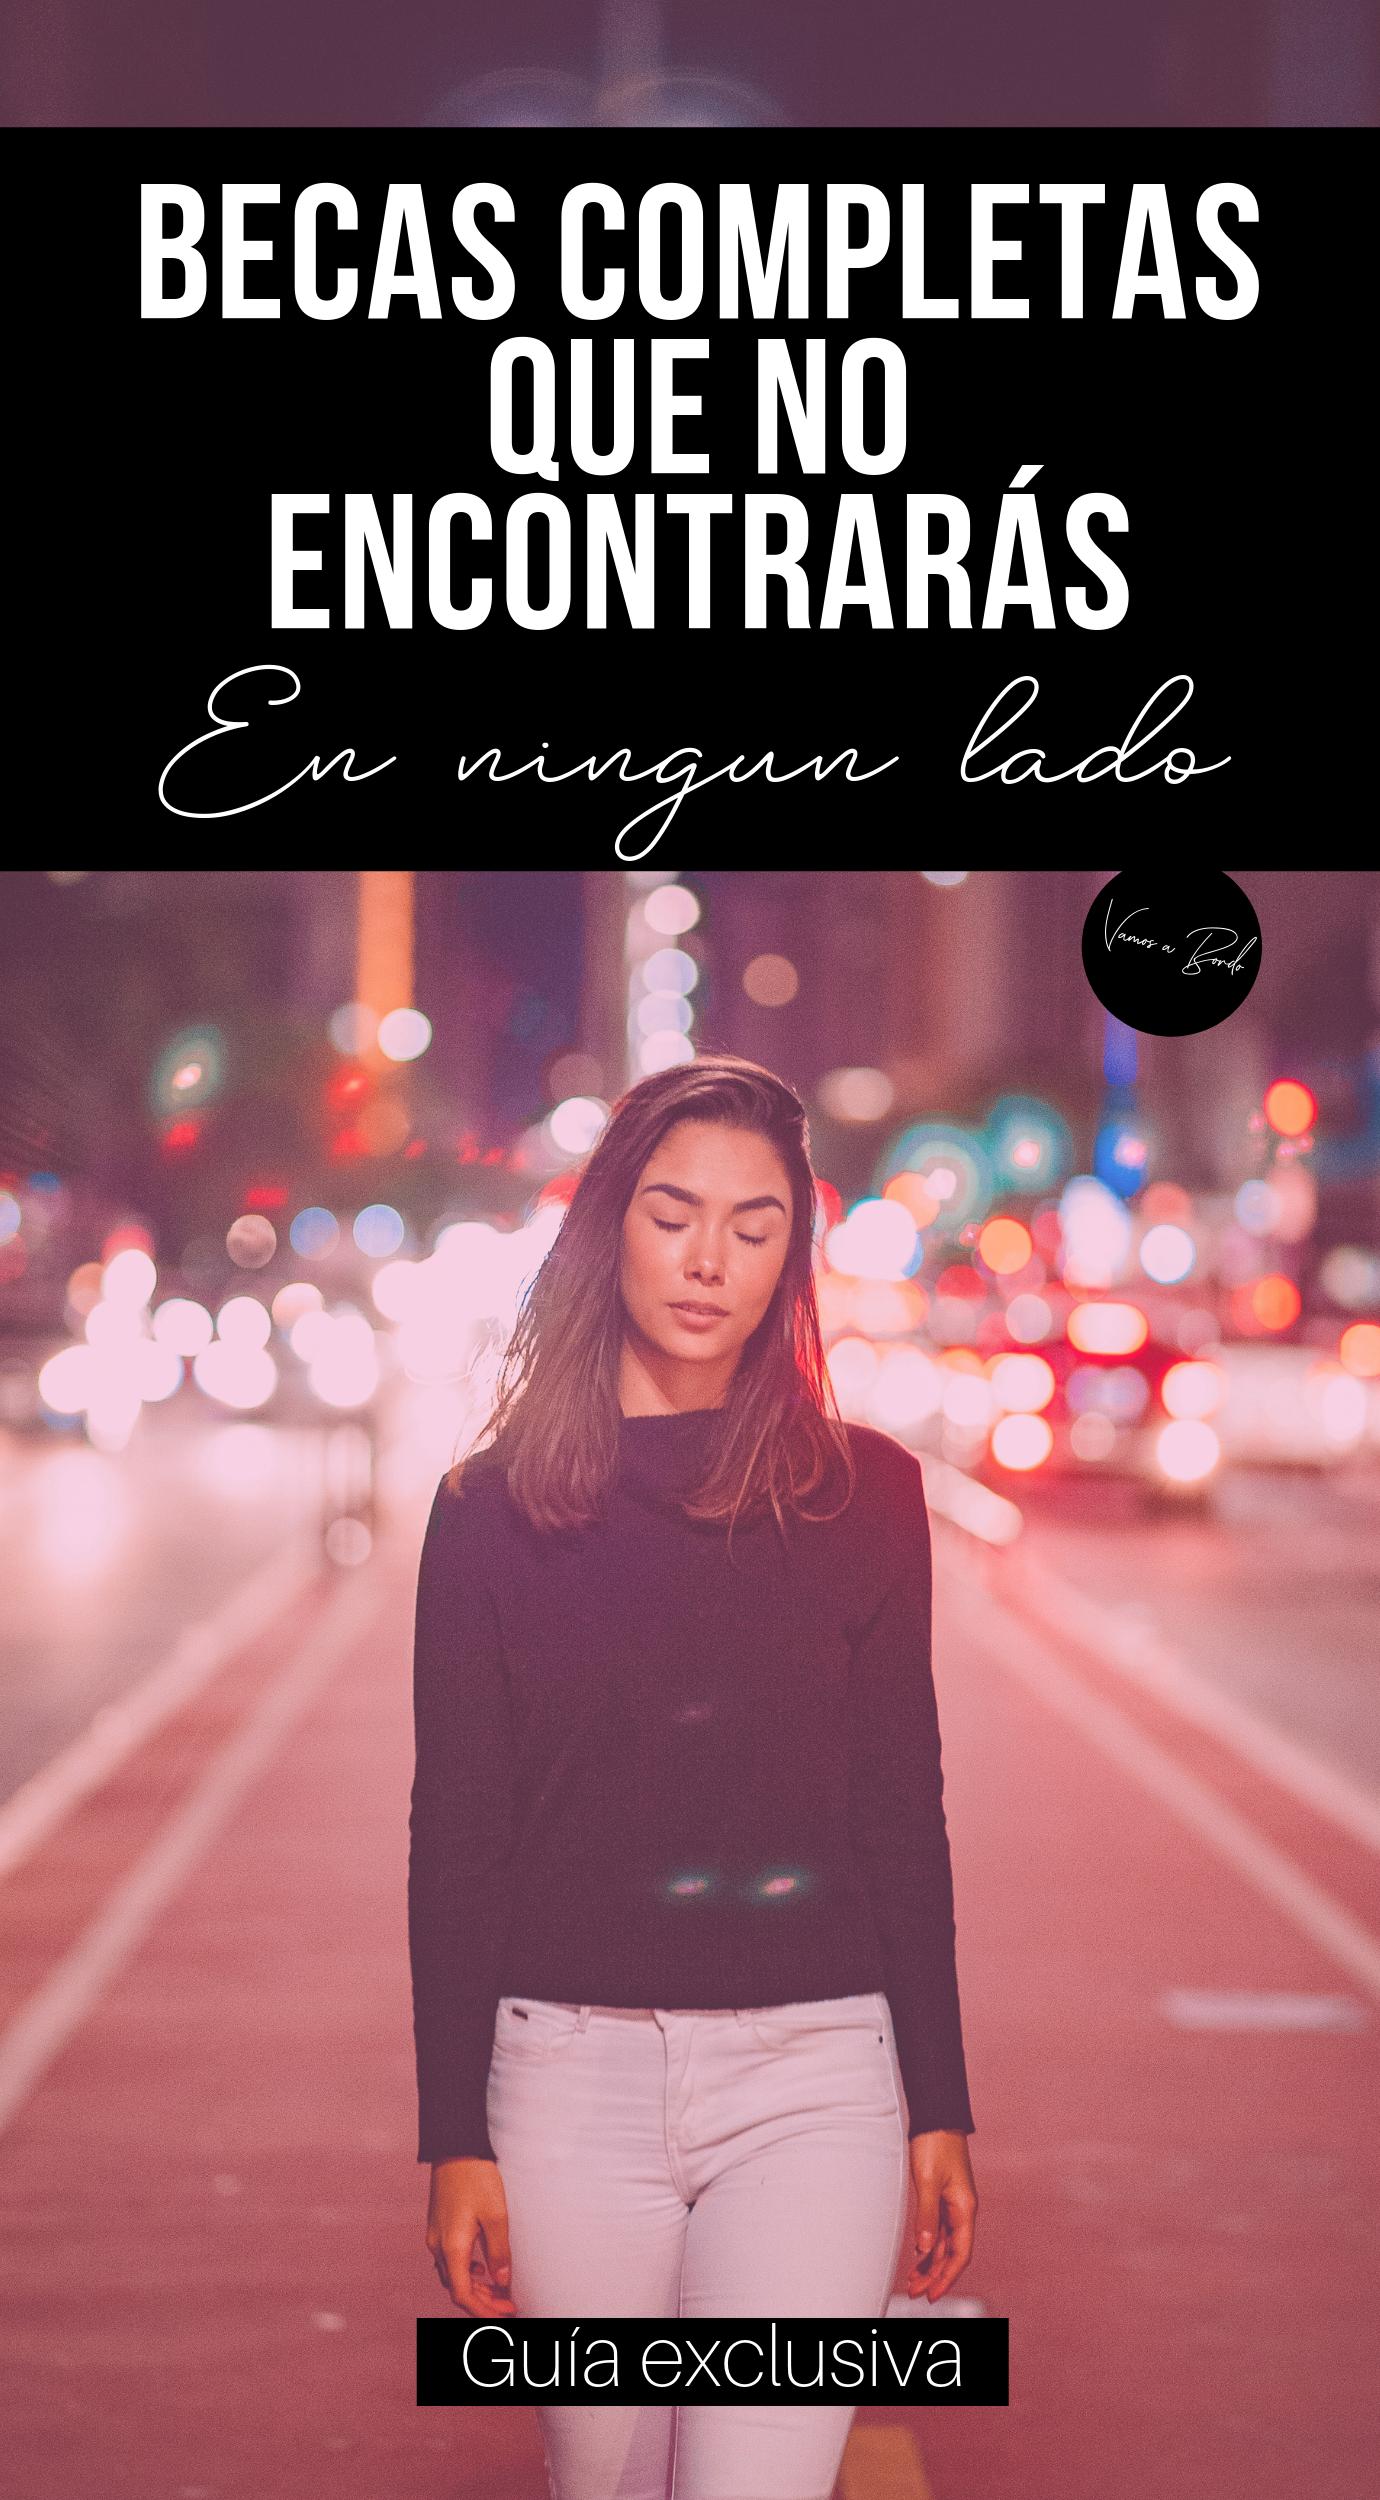 Becas Para Latinoamericanos 2021 Guía Oficial Vamos A Bordo Becas En El Extranjero Becas Universitarias Carreras Para Estudiar